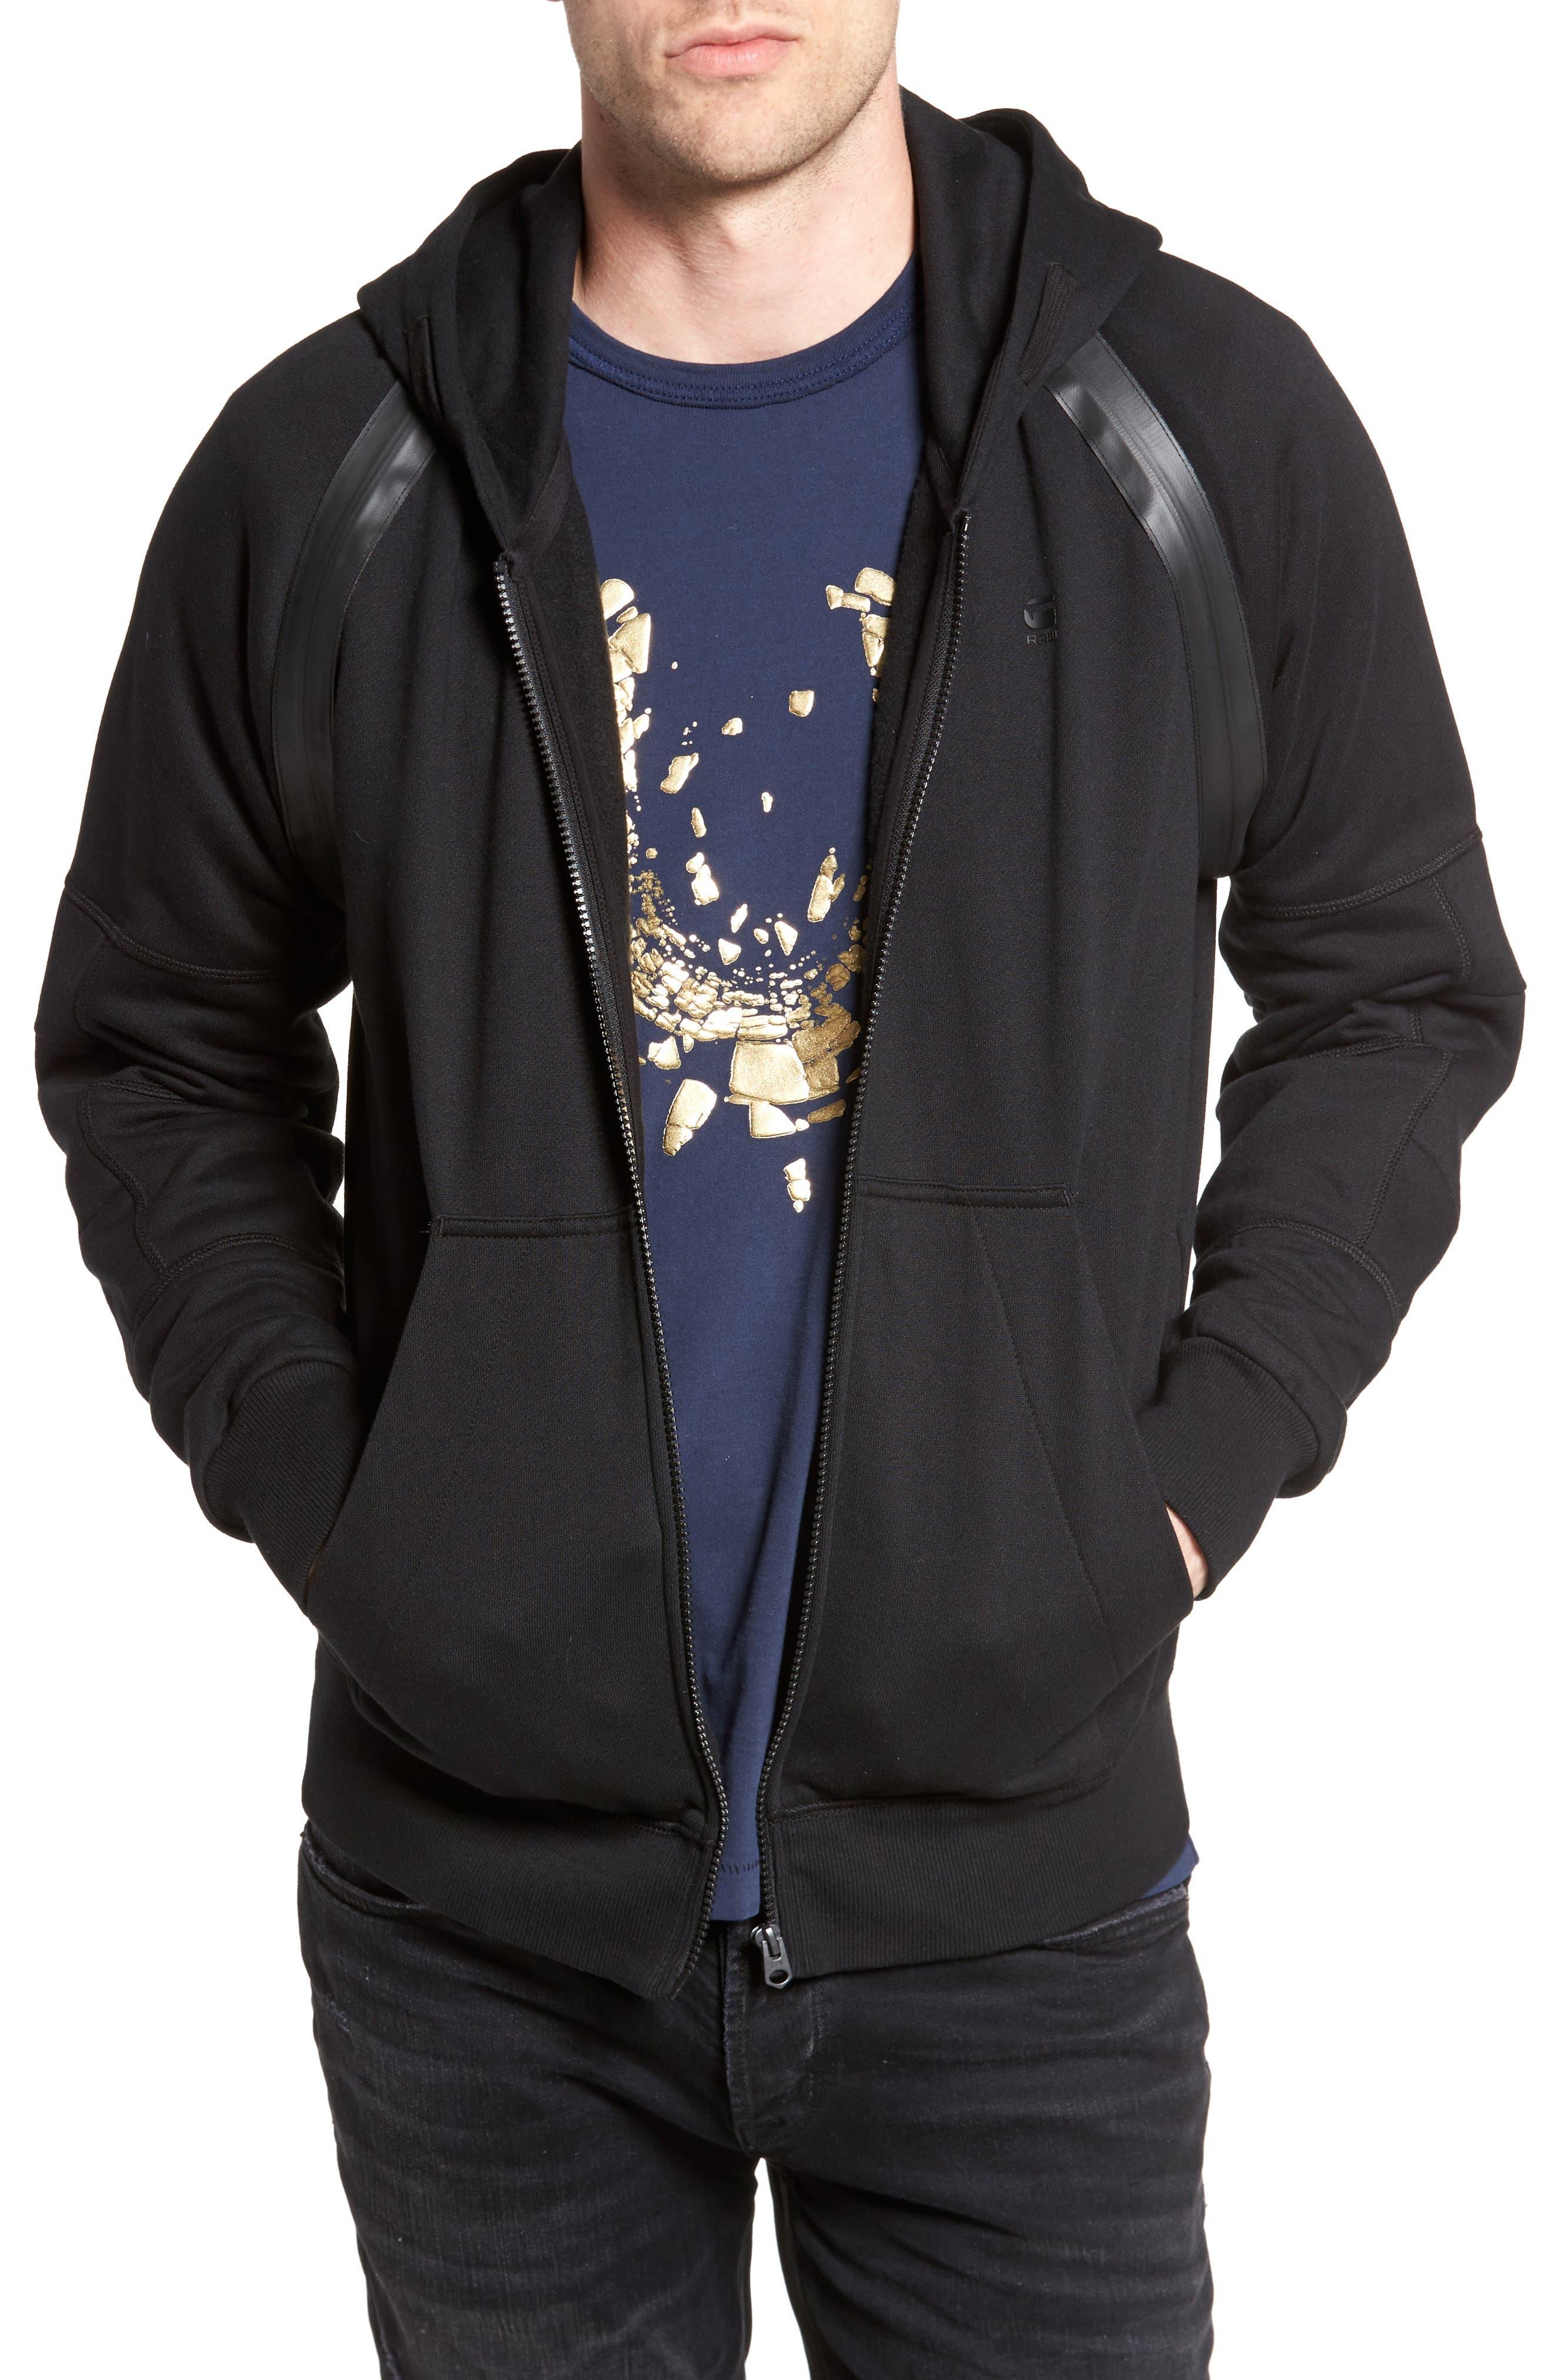 Alternate Image 1 Selected - G-Star Raw Rackam Zip Hoodie with Faux Leather Trim